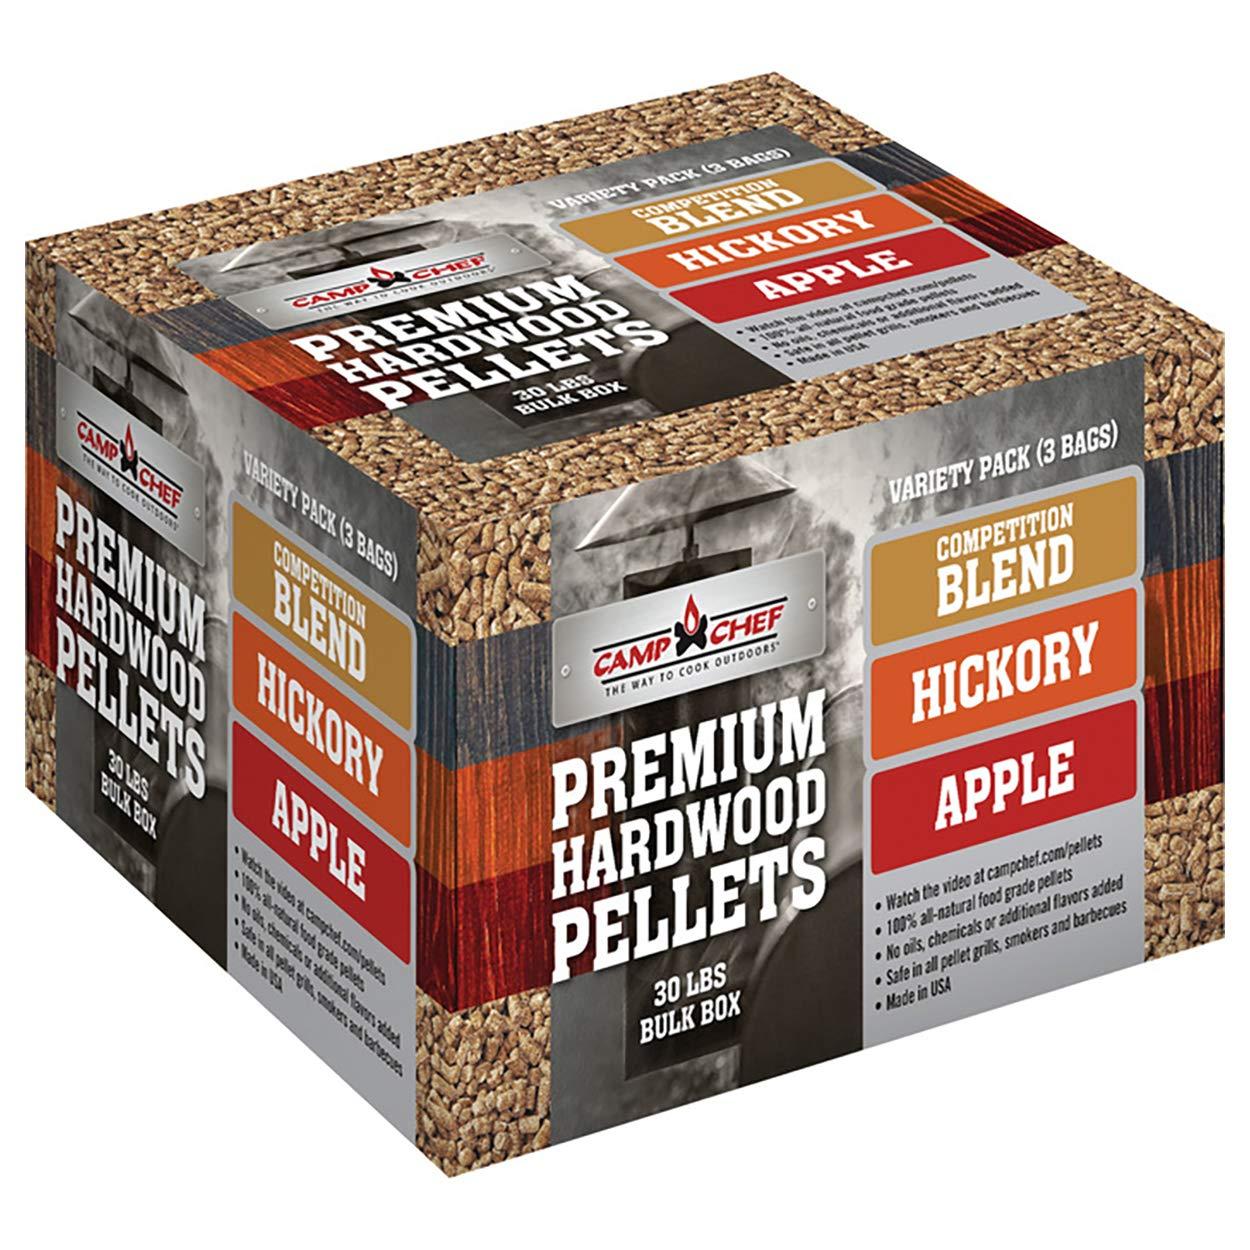 Camp Chef Cherry Premium Hardwood Pellets PLCY Grill Accessories